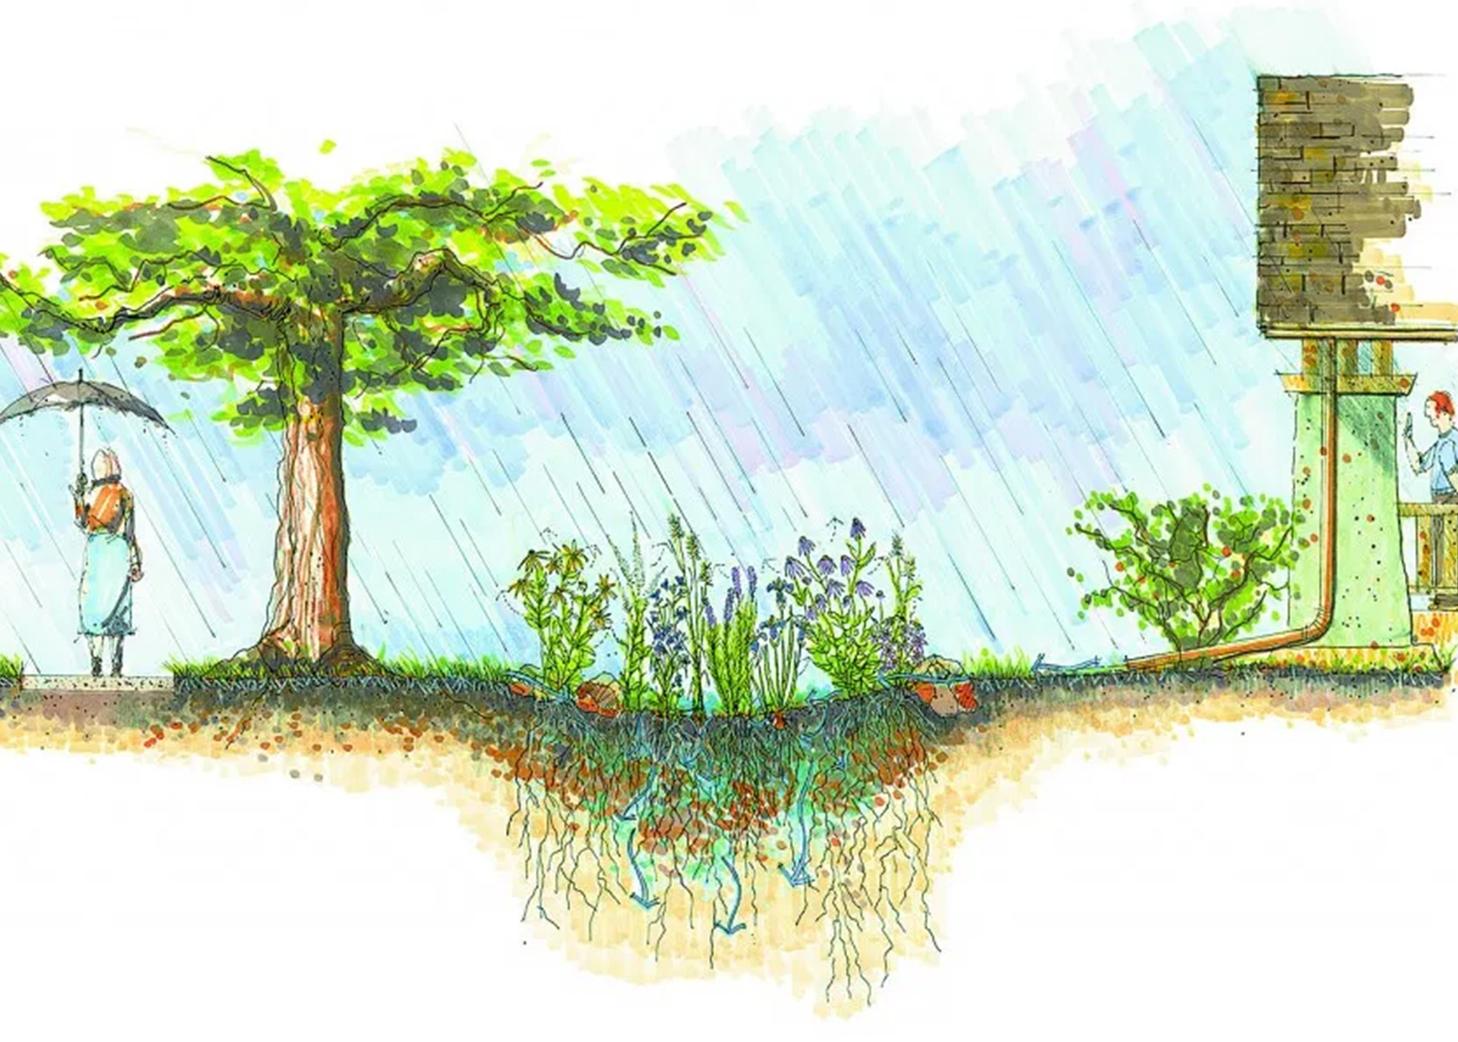 Corte ilustrativo de um jardim de chuva